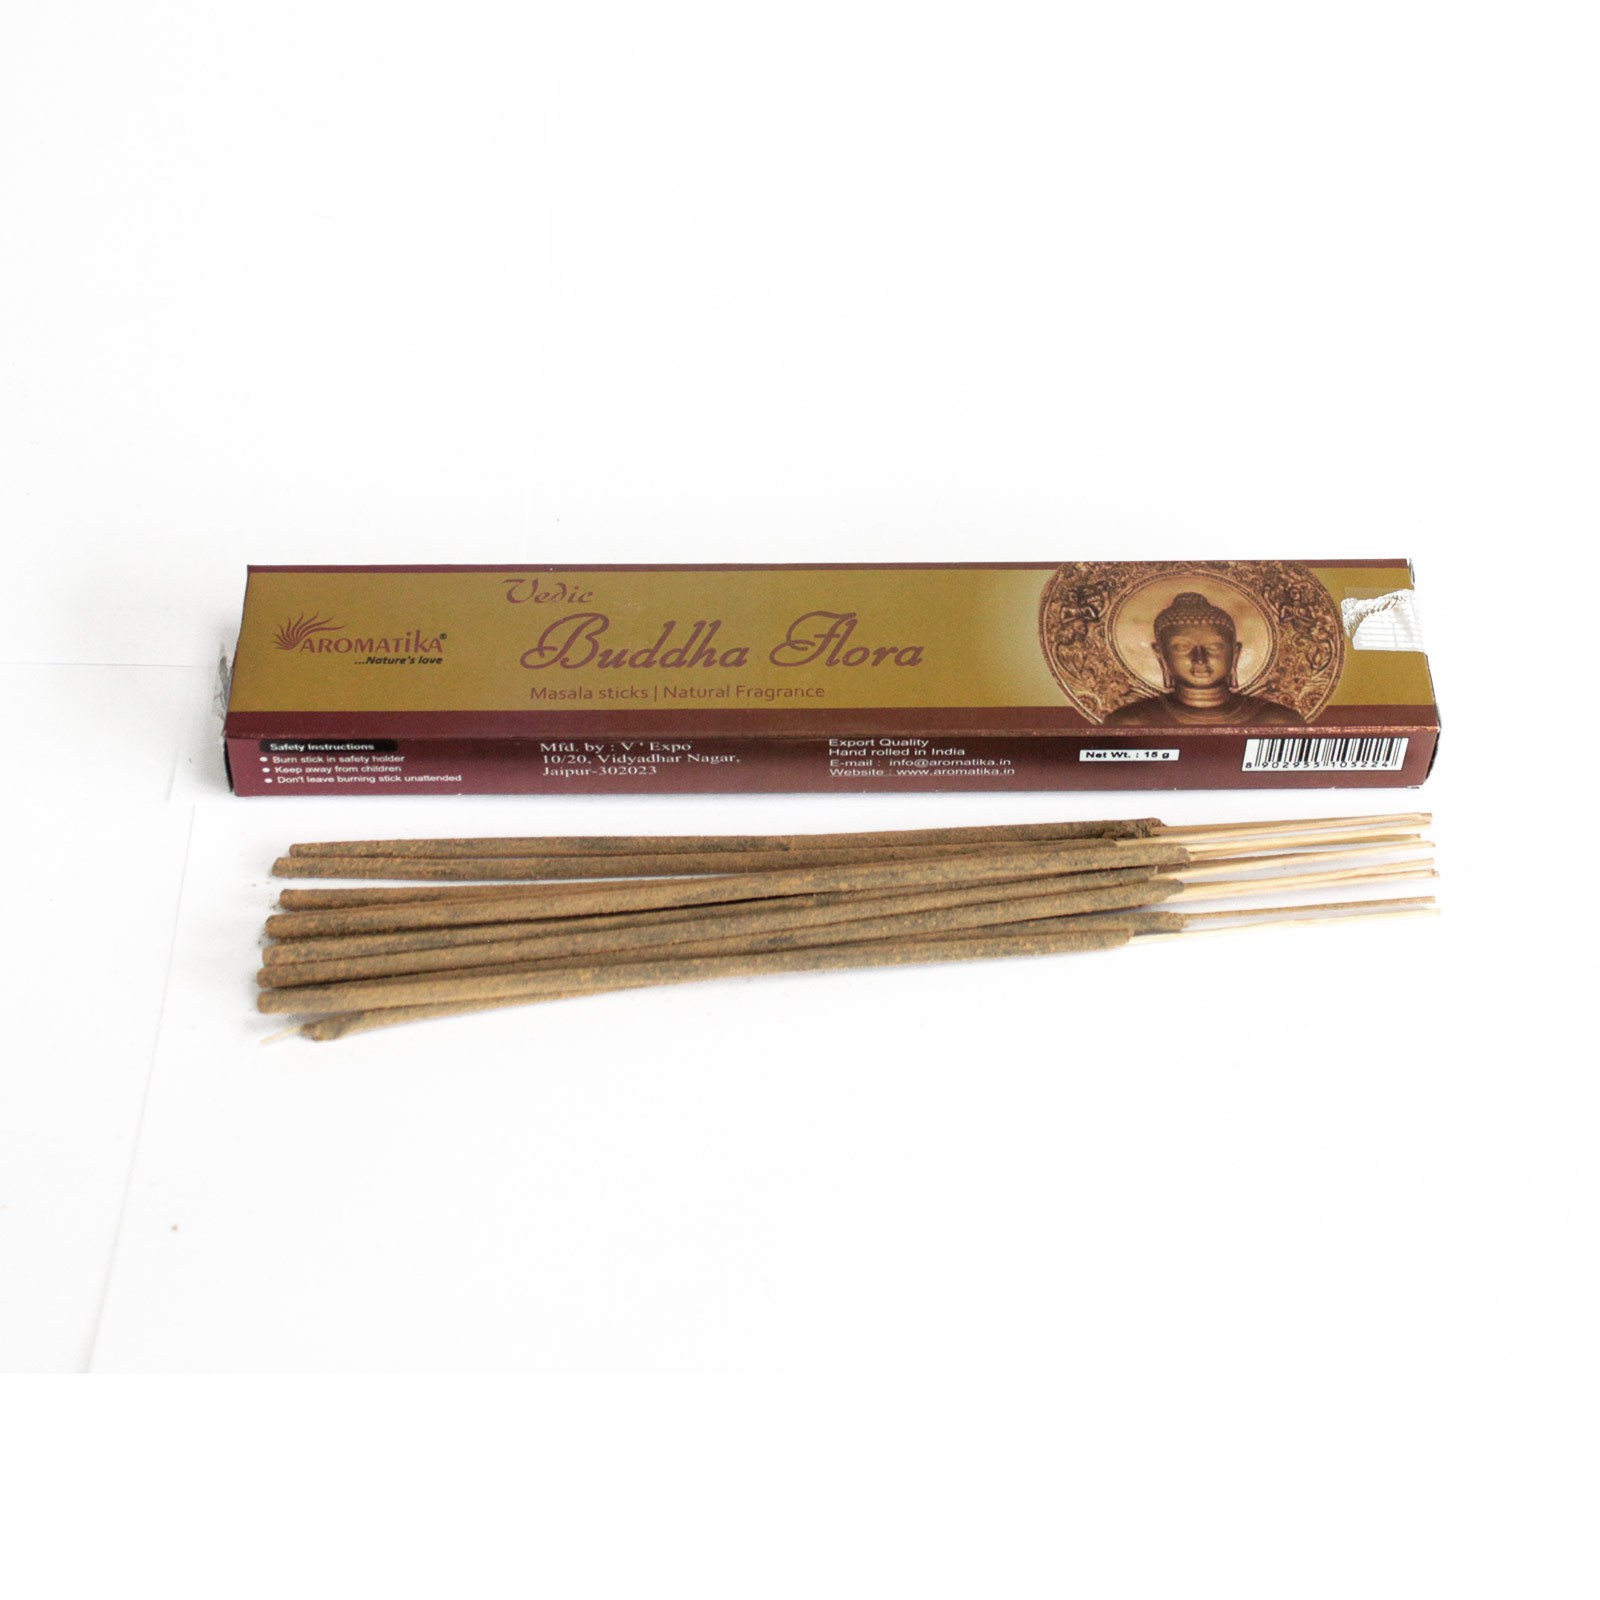 Vedic -Incense Sticks - Buddha Flora